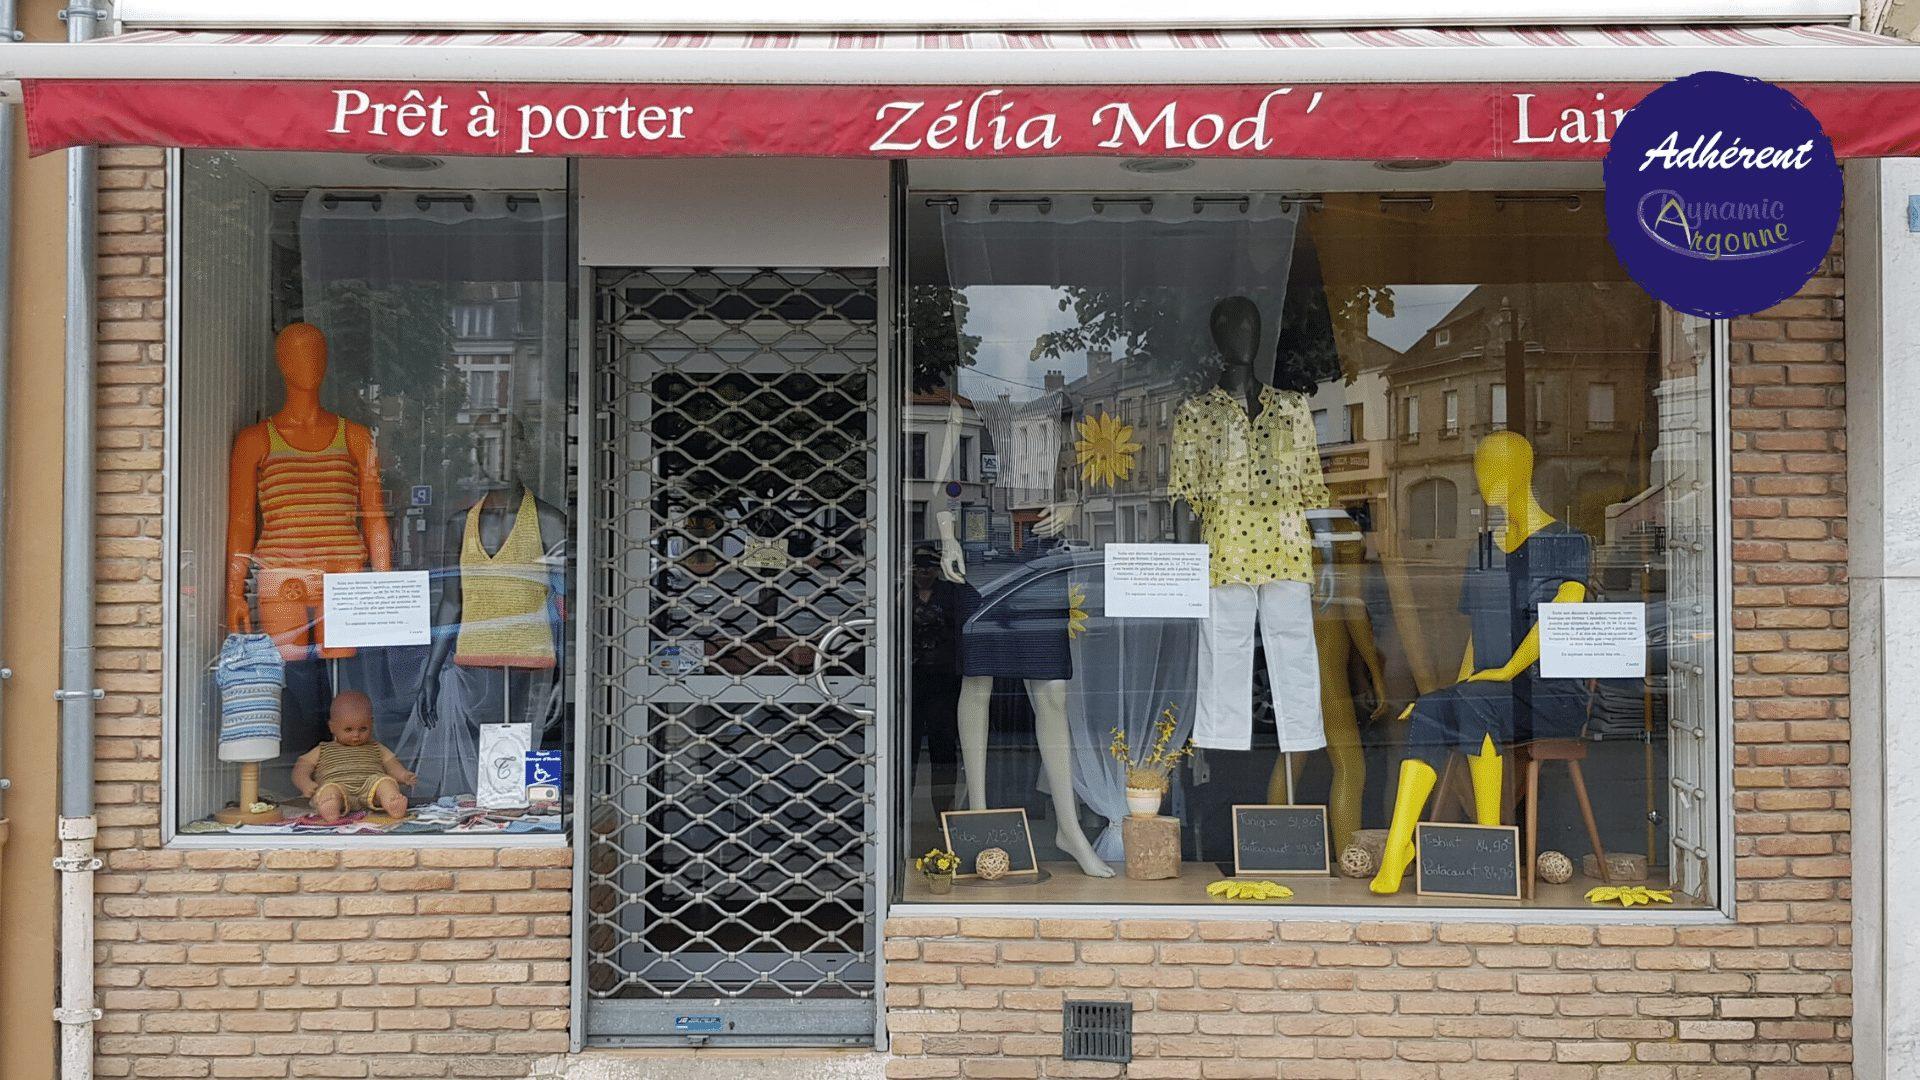 Zelia Mod